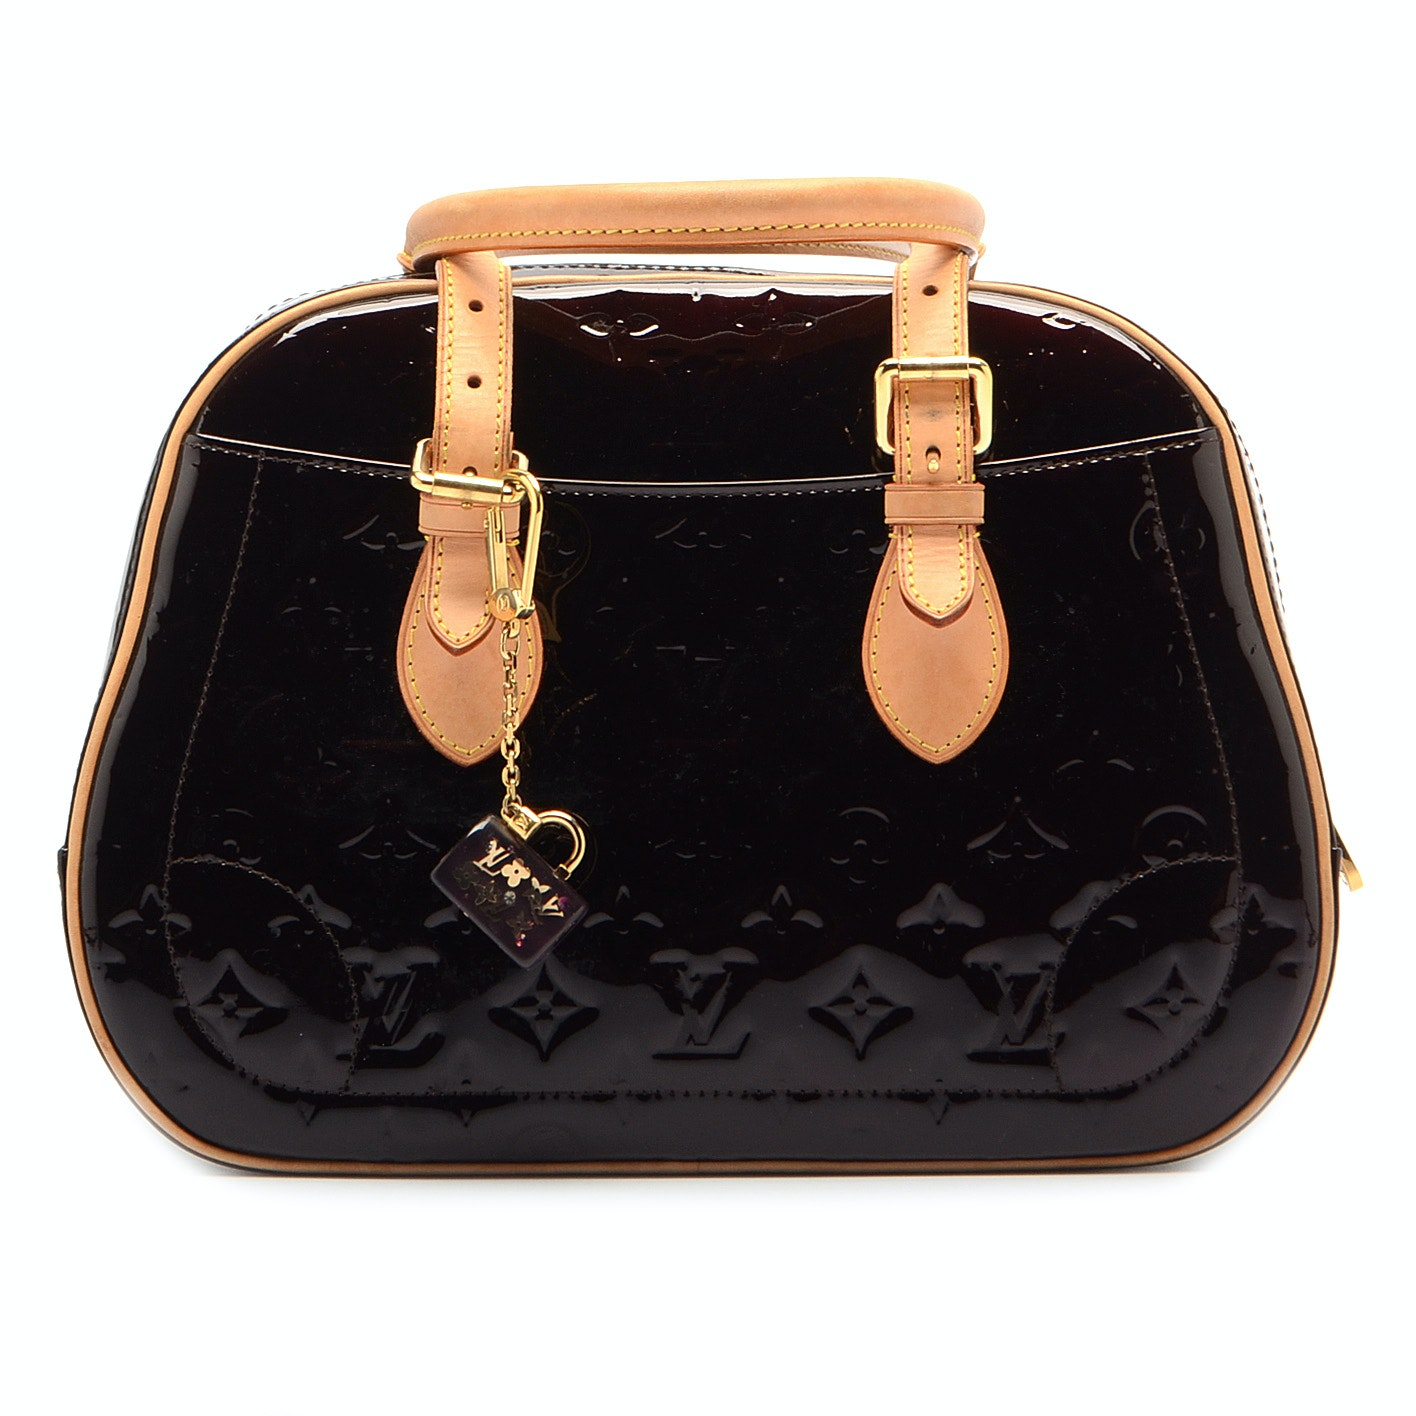 Louis Vuitton of Paris Vernis Summit Drive Amarante Handbag and Coin Case